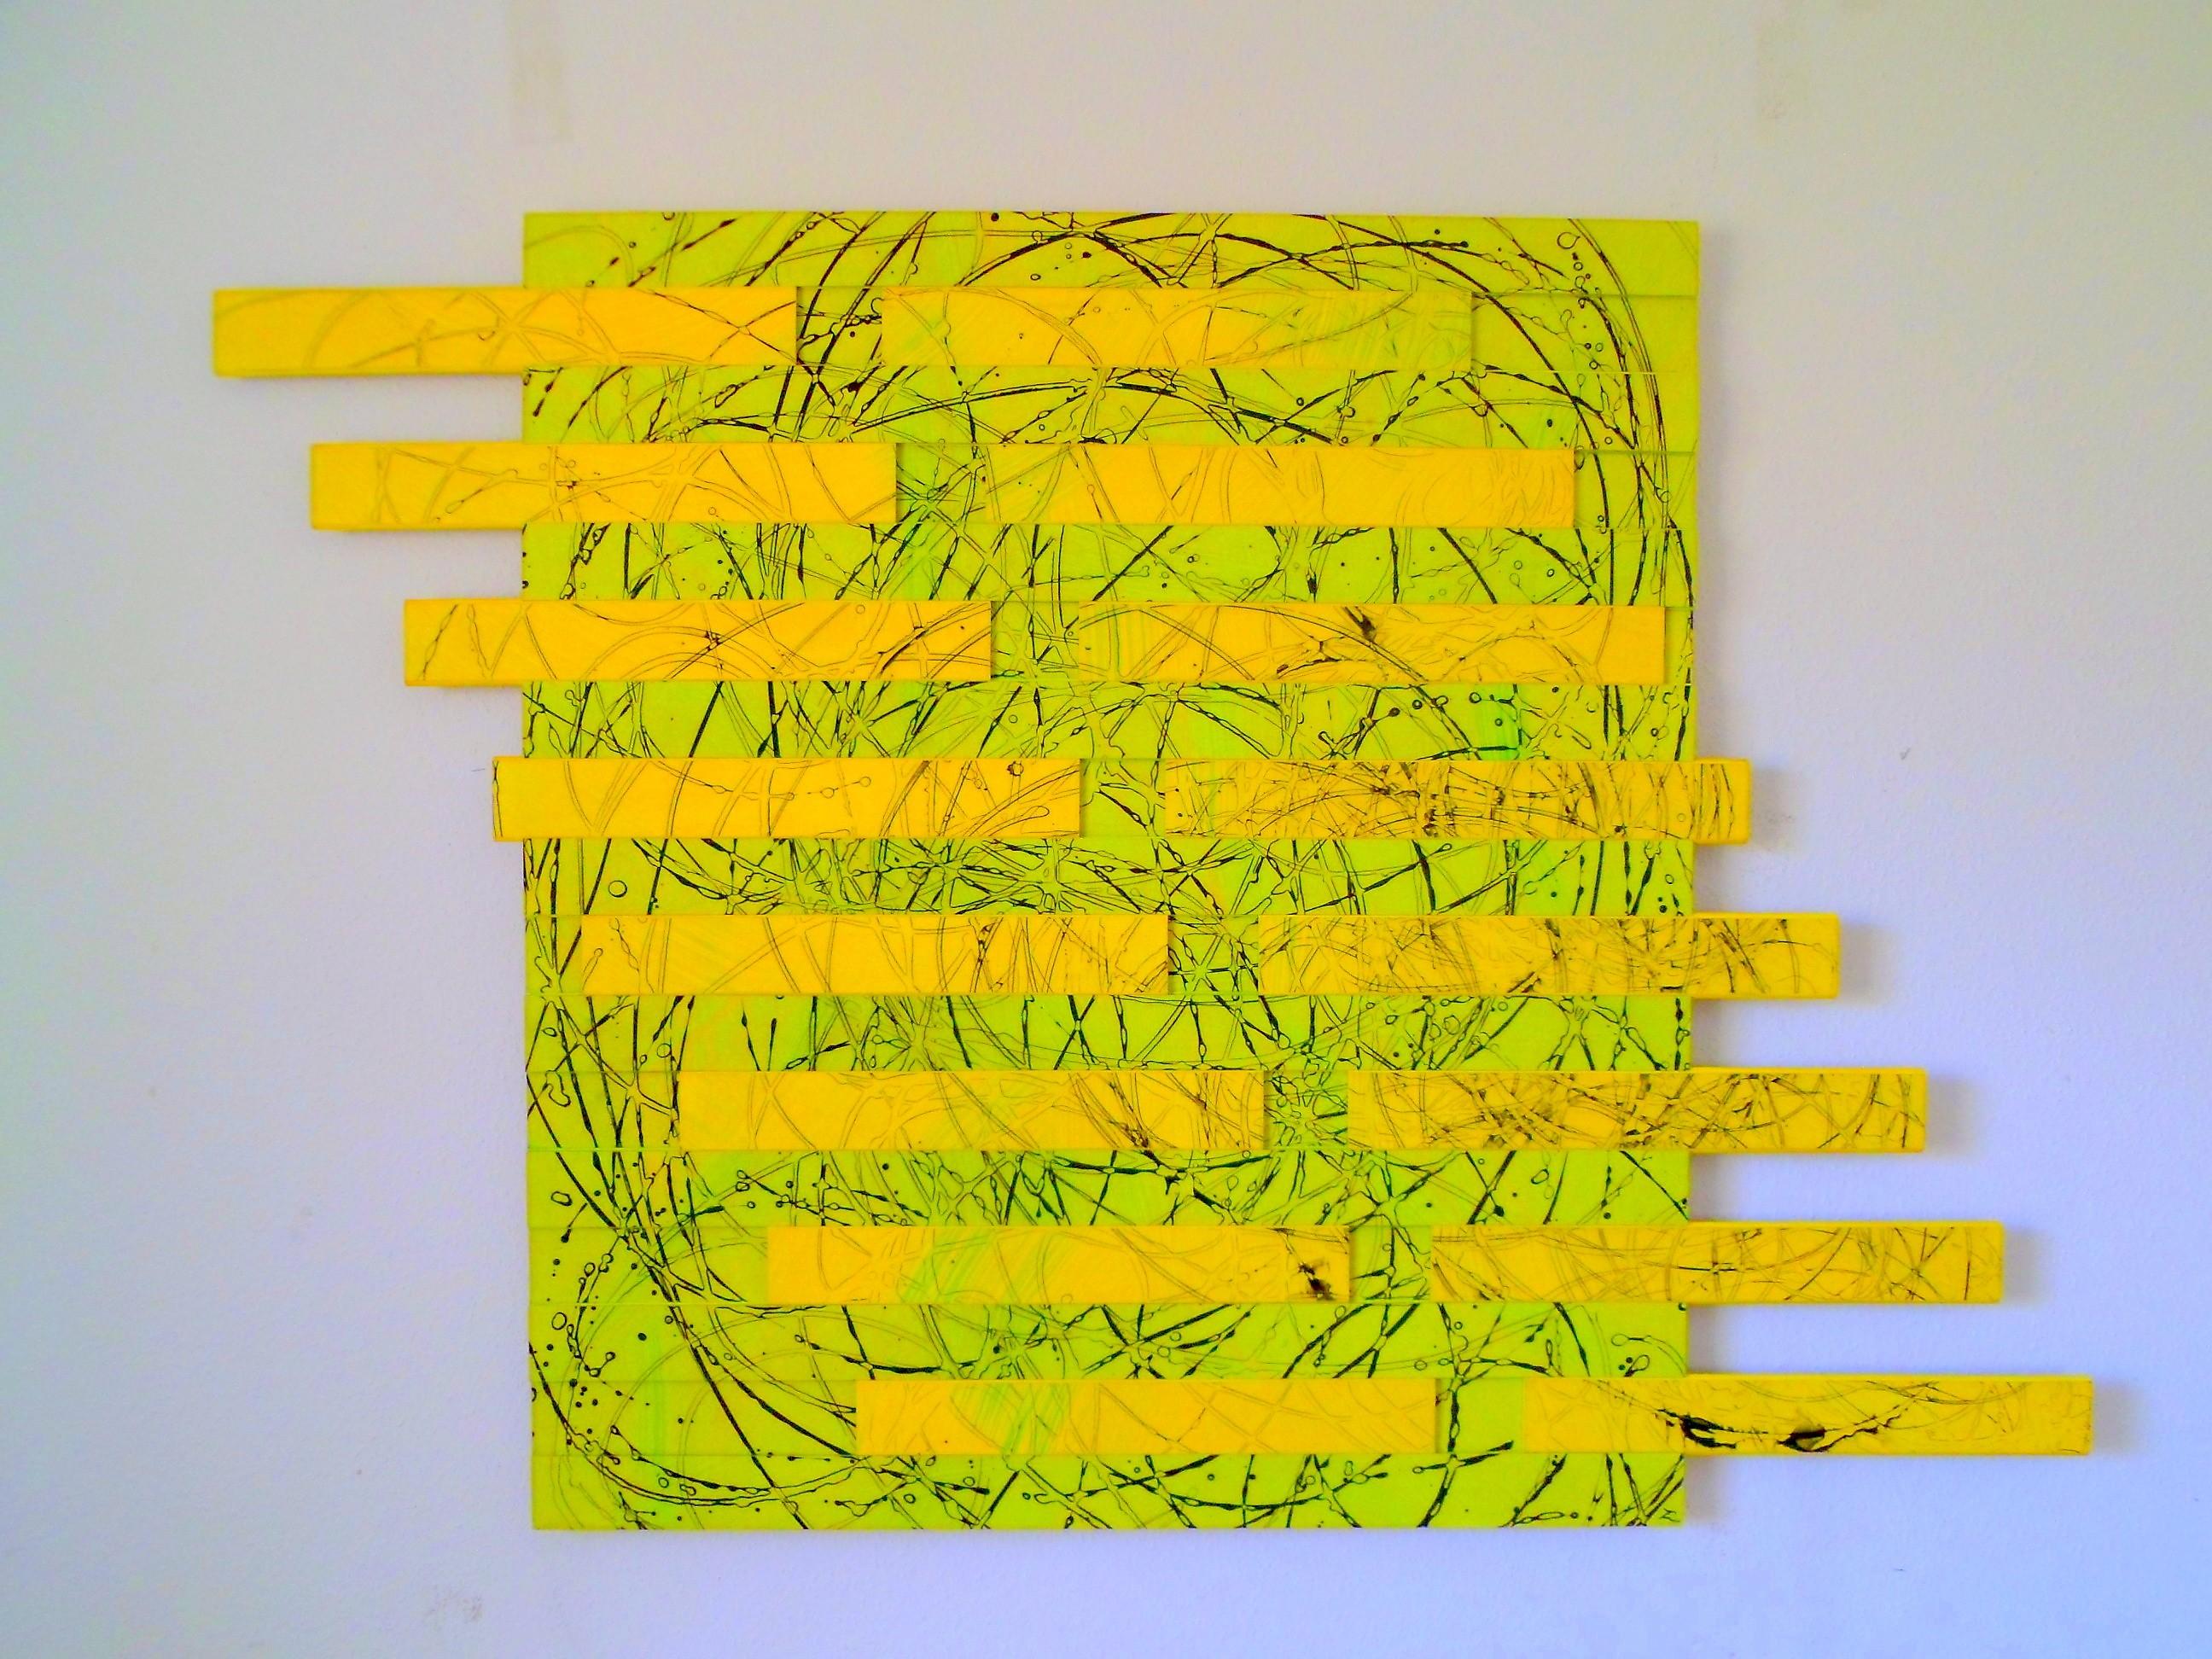 Ausstellung Maria Maier giving color